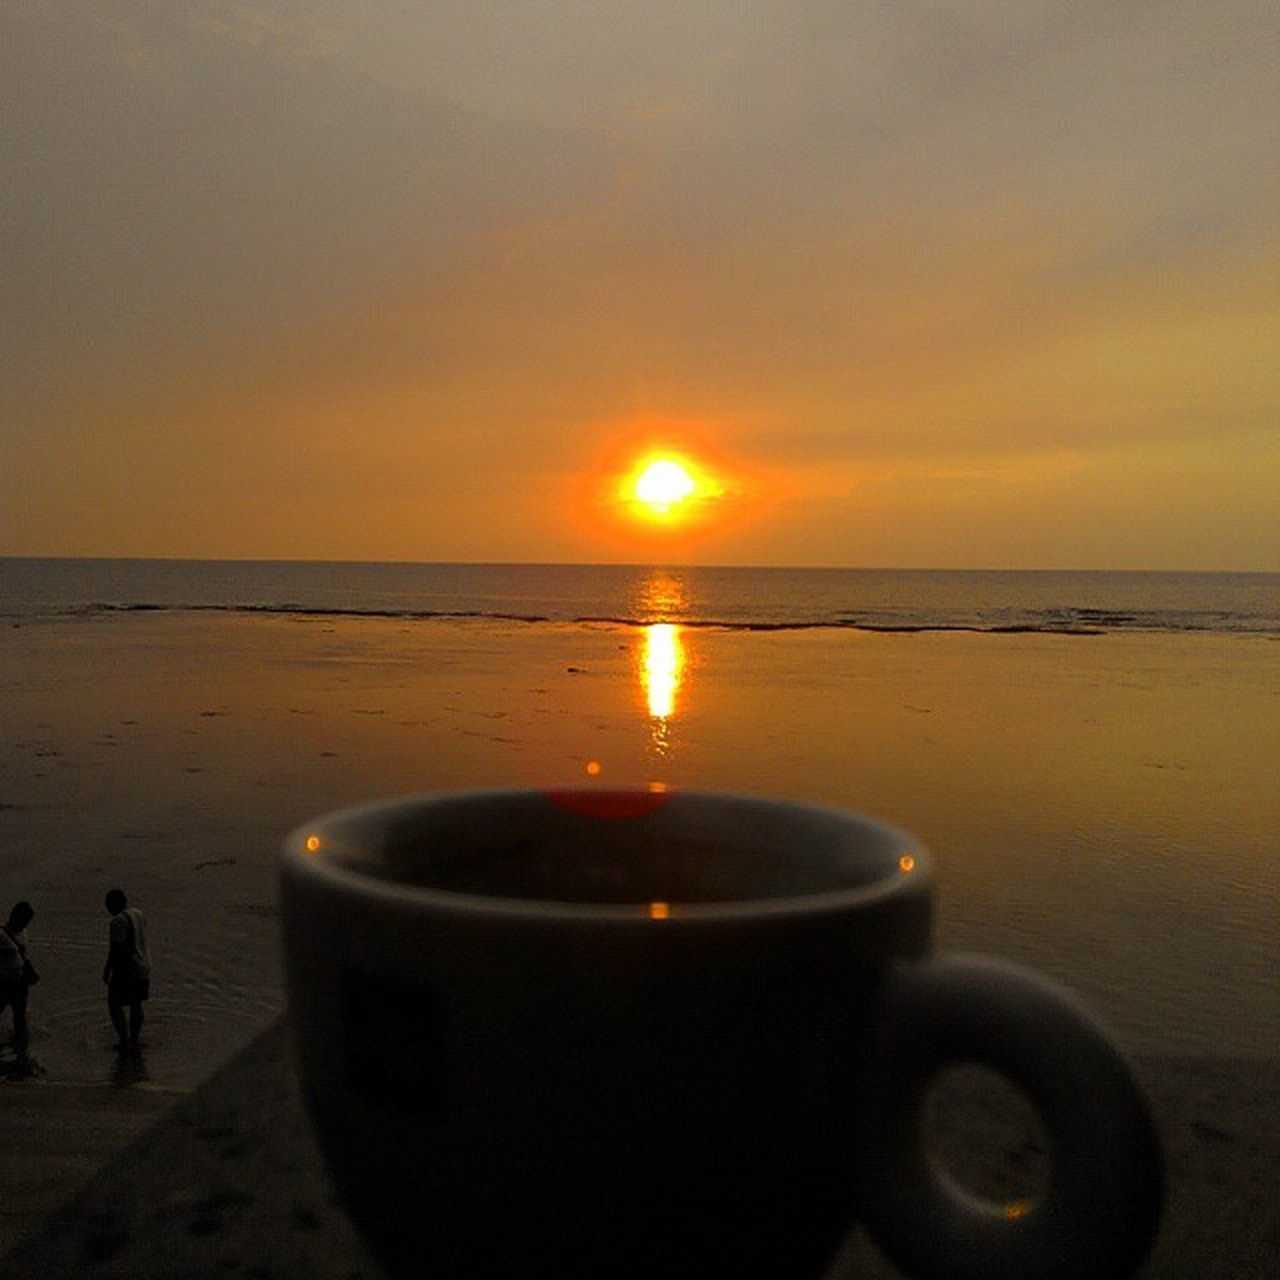 Sunset Couple and Coffee Pasangan Senja  dan Kopi SORE Anyer  Banten INDONESIA Lenovotography Photophone  Lzybstrd Photooftheday Beach Jingga Love Prewed Coupleoftheyear Pocketphotography Fatamorphosis